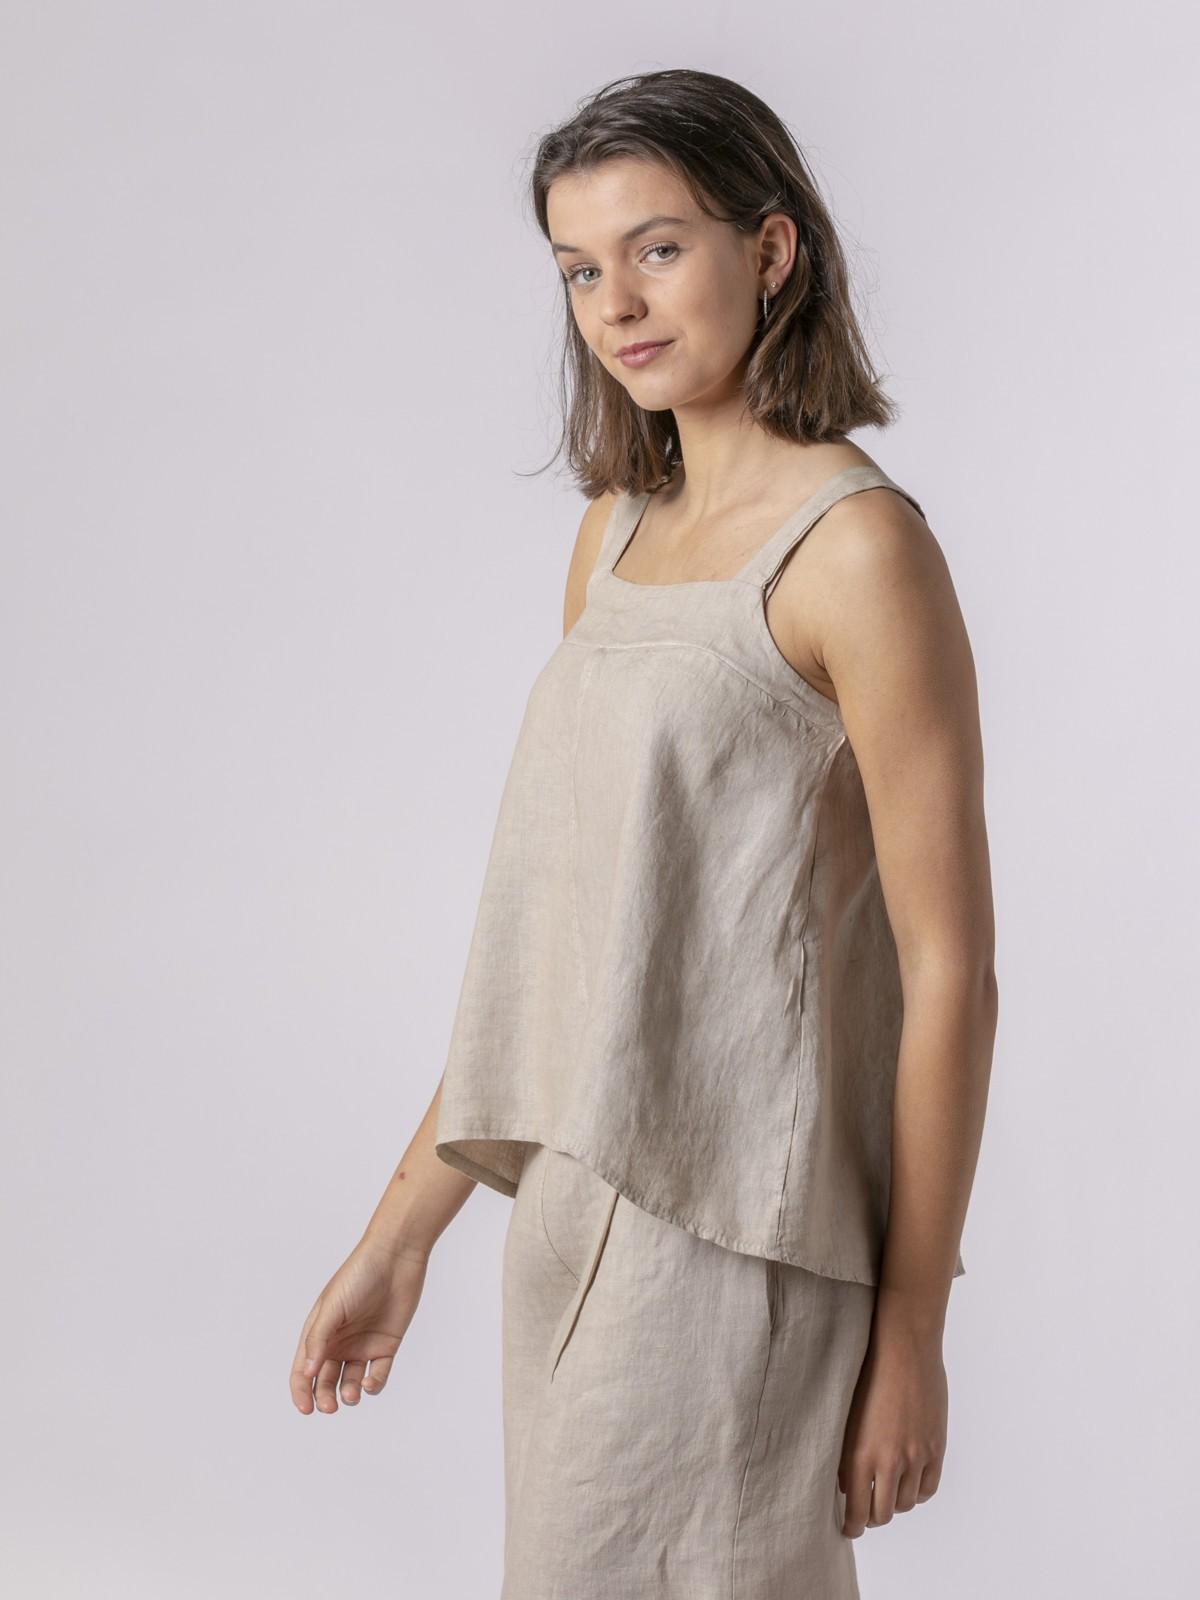 Top de lino mujer detalle espalda Beige